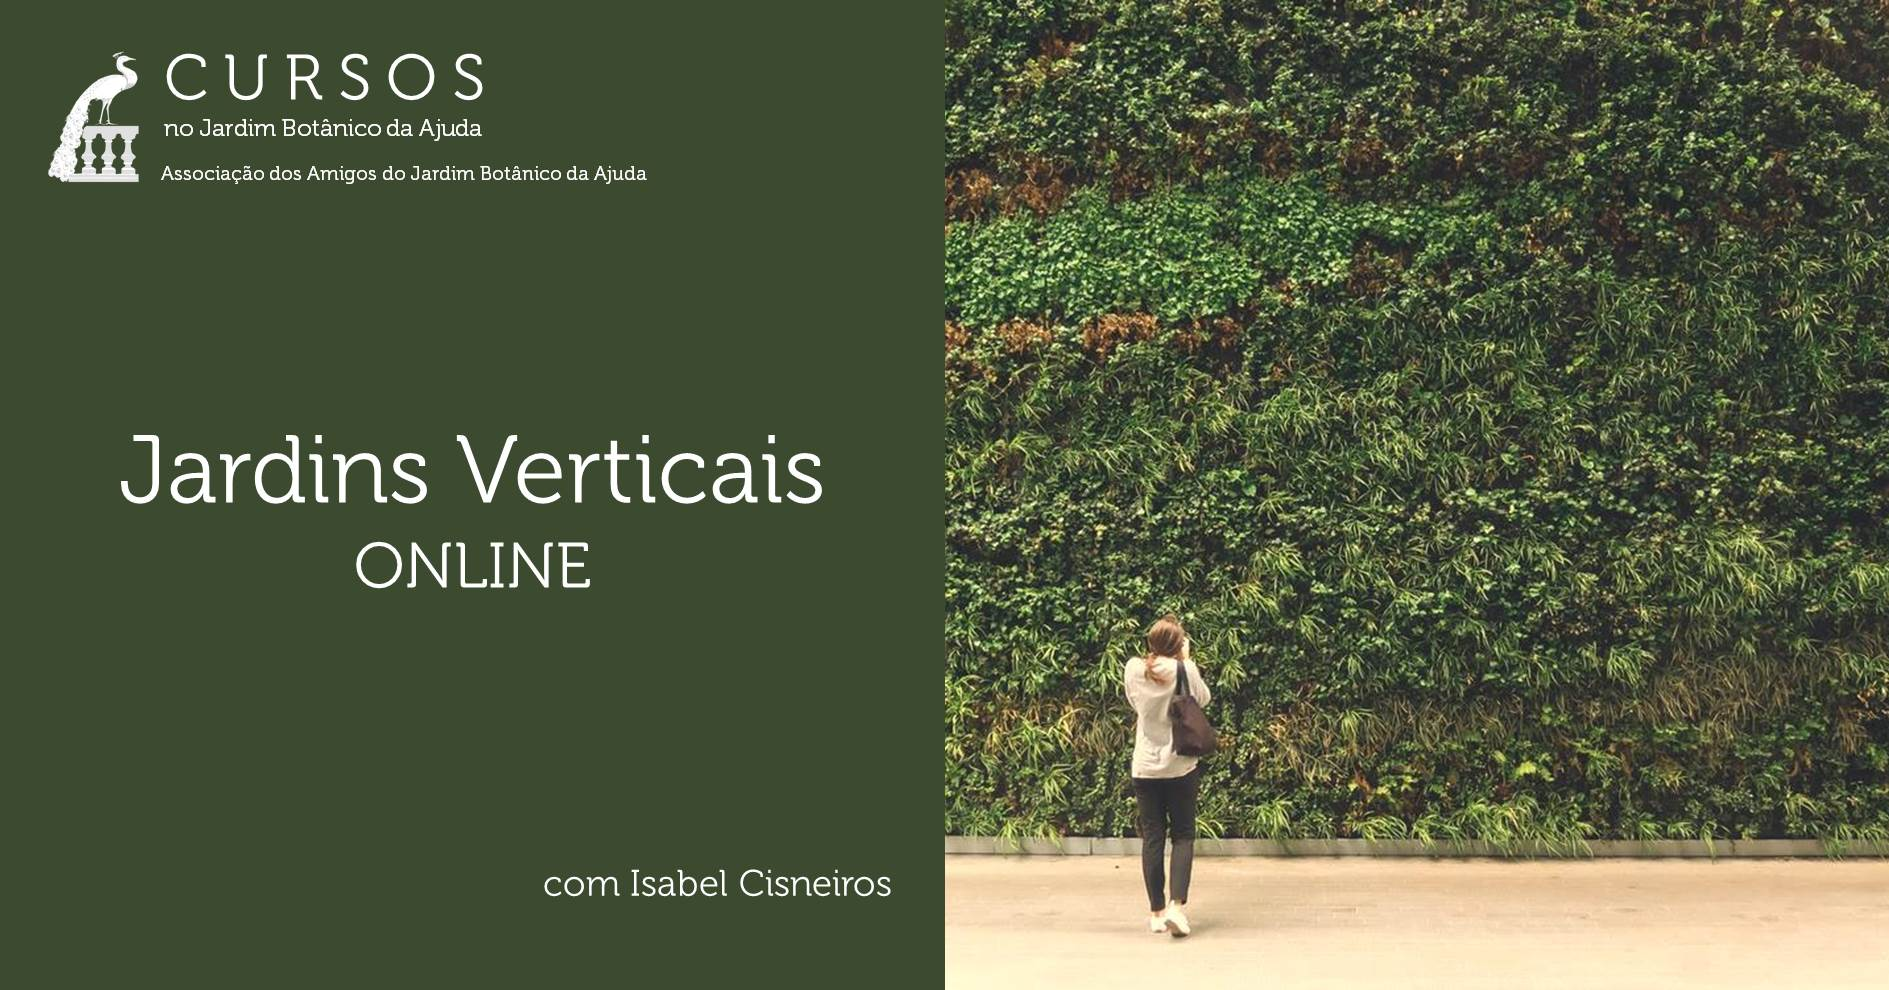 Jardins Verticais ONLINE